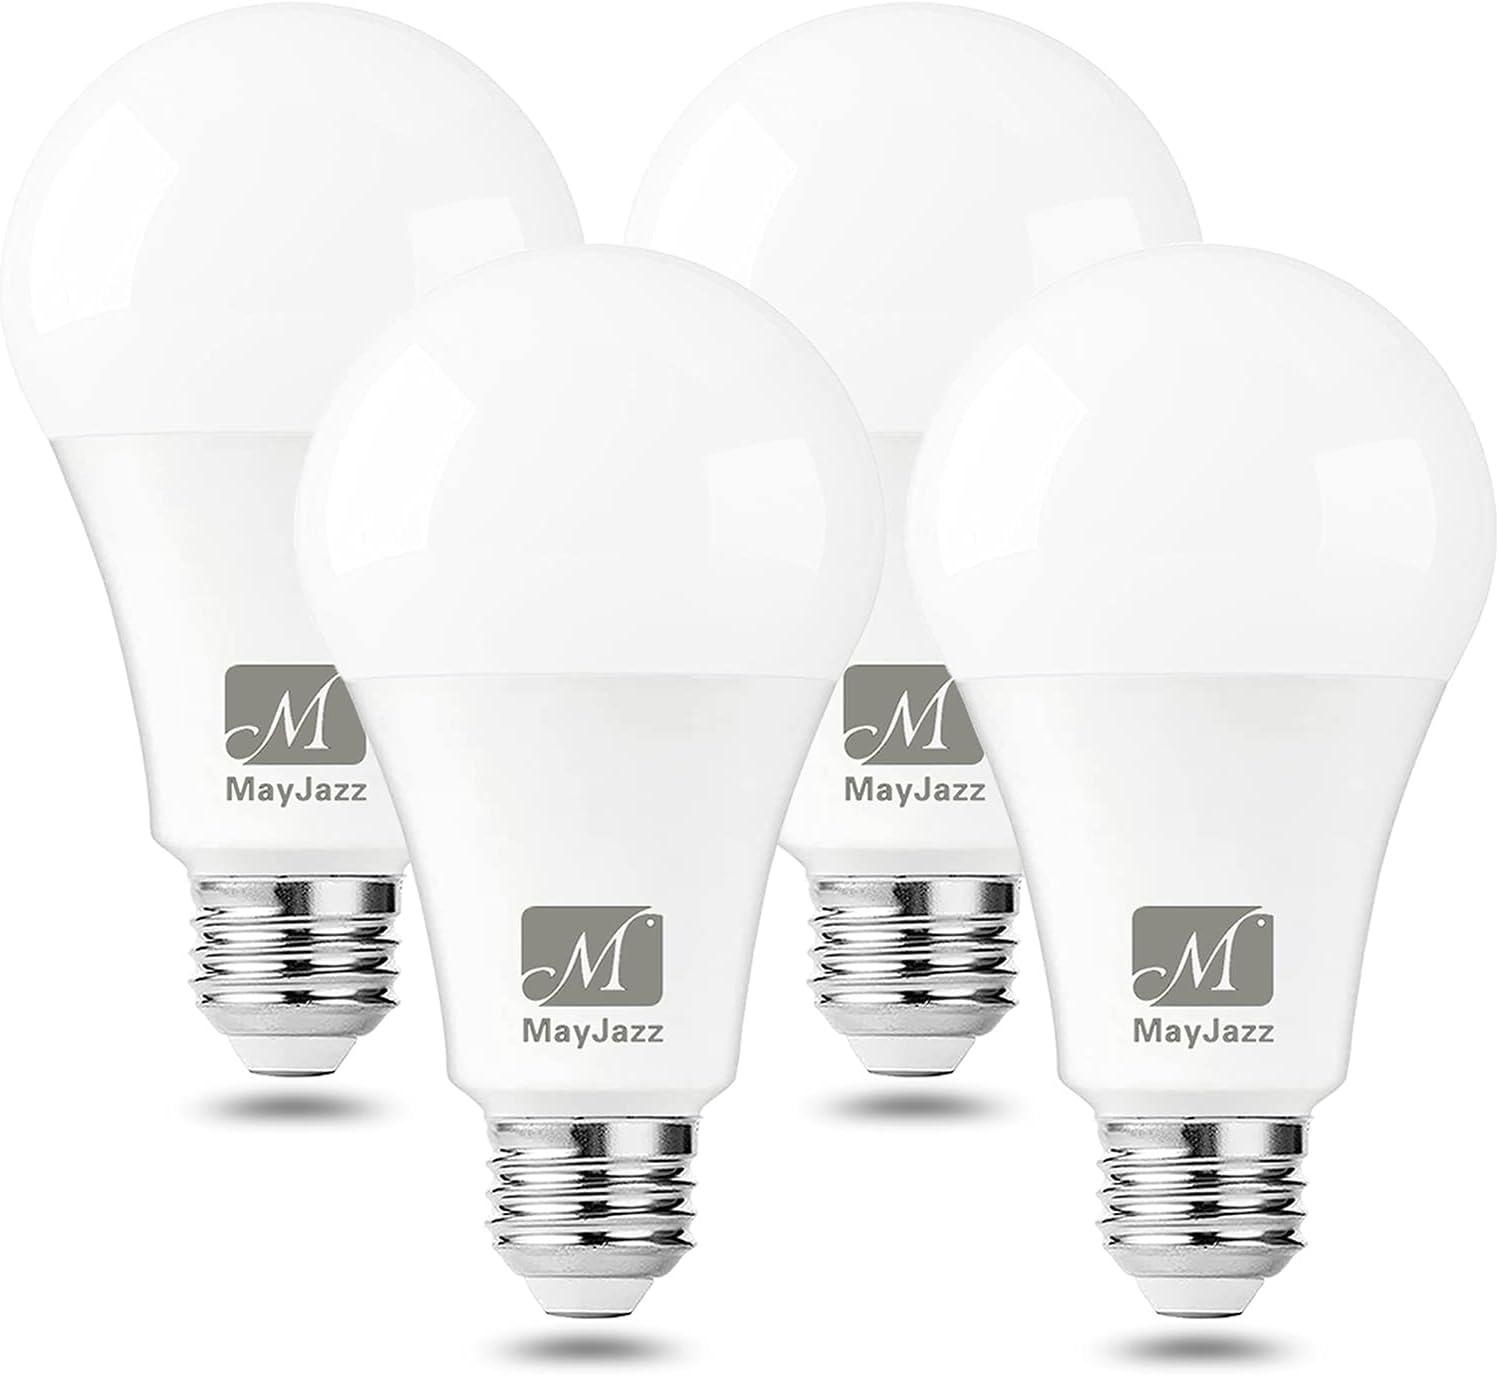 A19 LED Light Bulbs M MayJazz Warm 1 3000K Max Now on sale 81% OFF Led 15W White Bulb